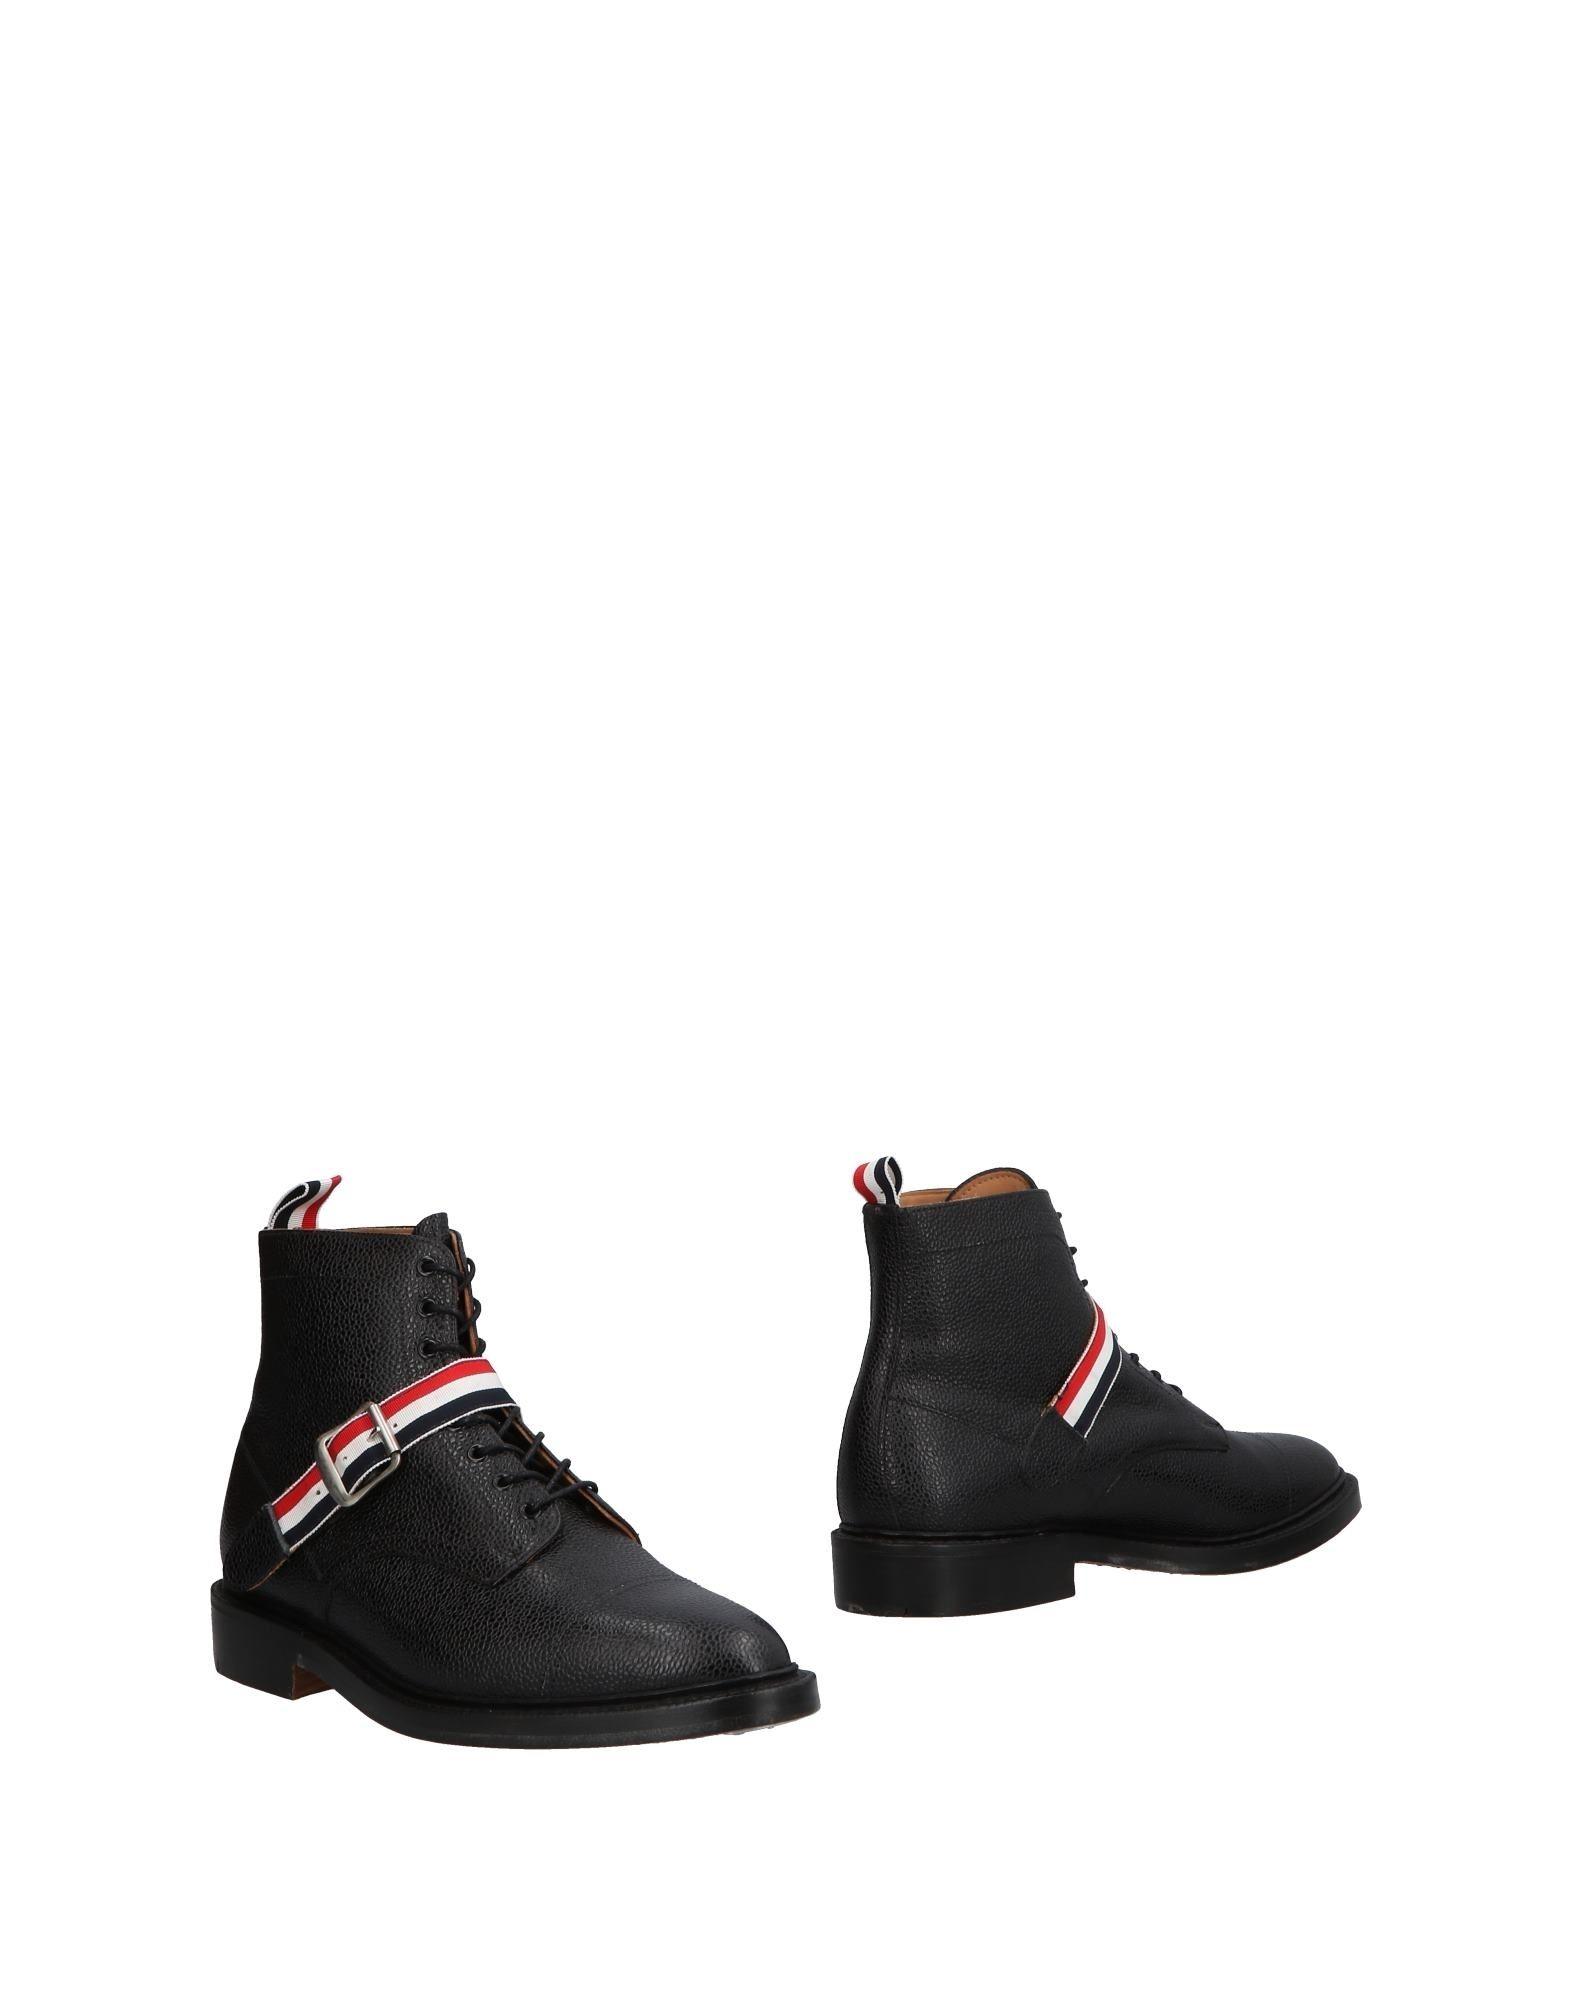 Thom Browne Stiefelette 11498084HQ Herren  11498084HQ Stiefelette Neue Schuhe e3e772